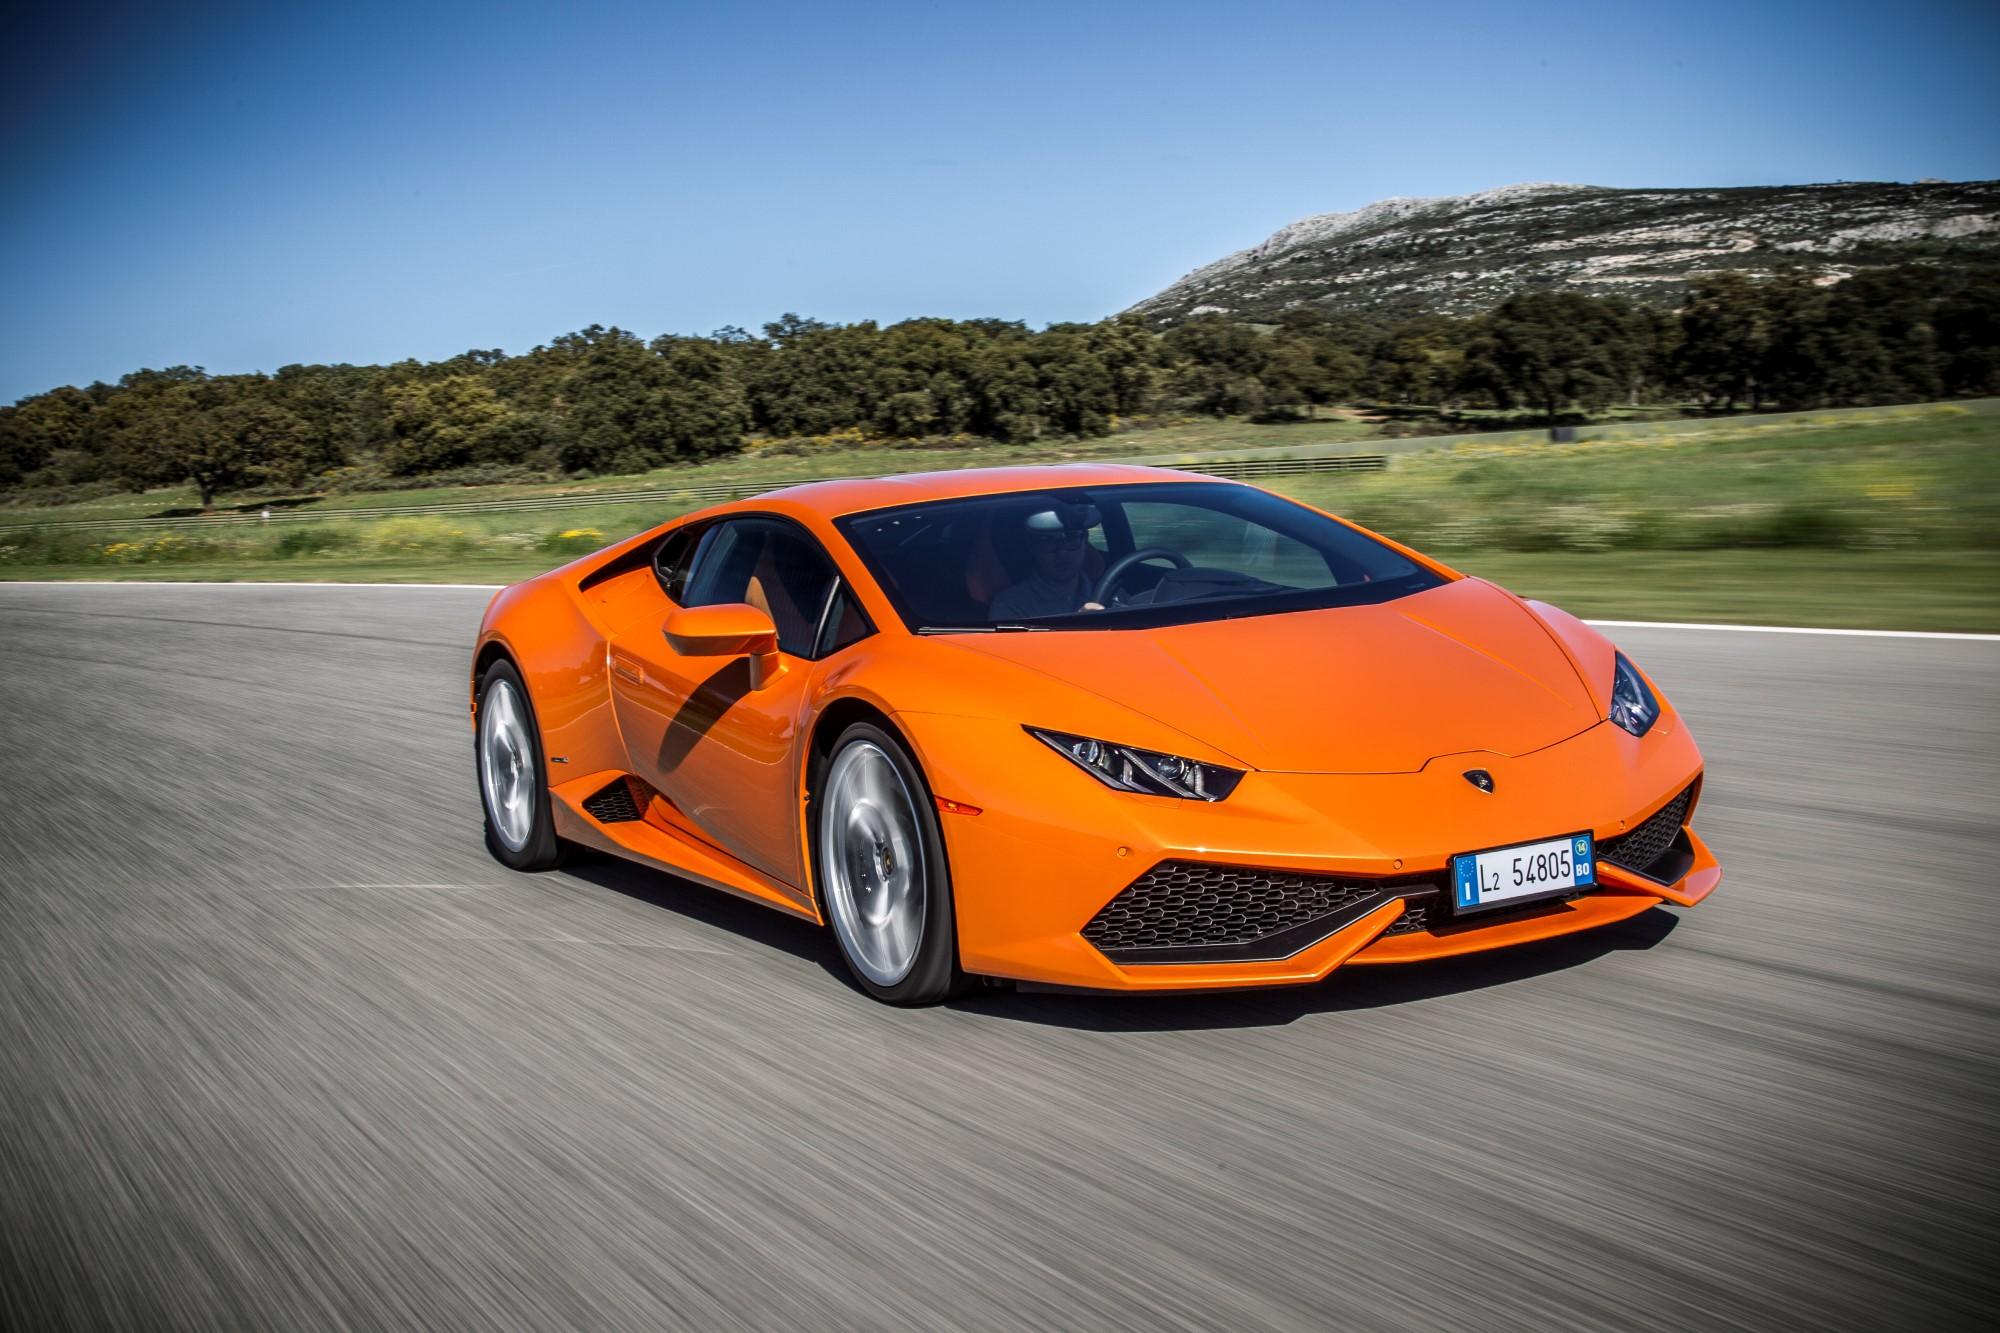 2015 Lamborghini Huracan Best Car To Buy Nominee